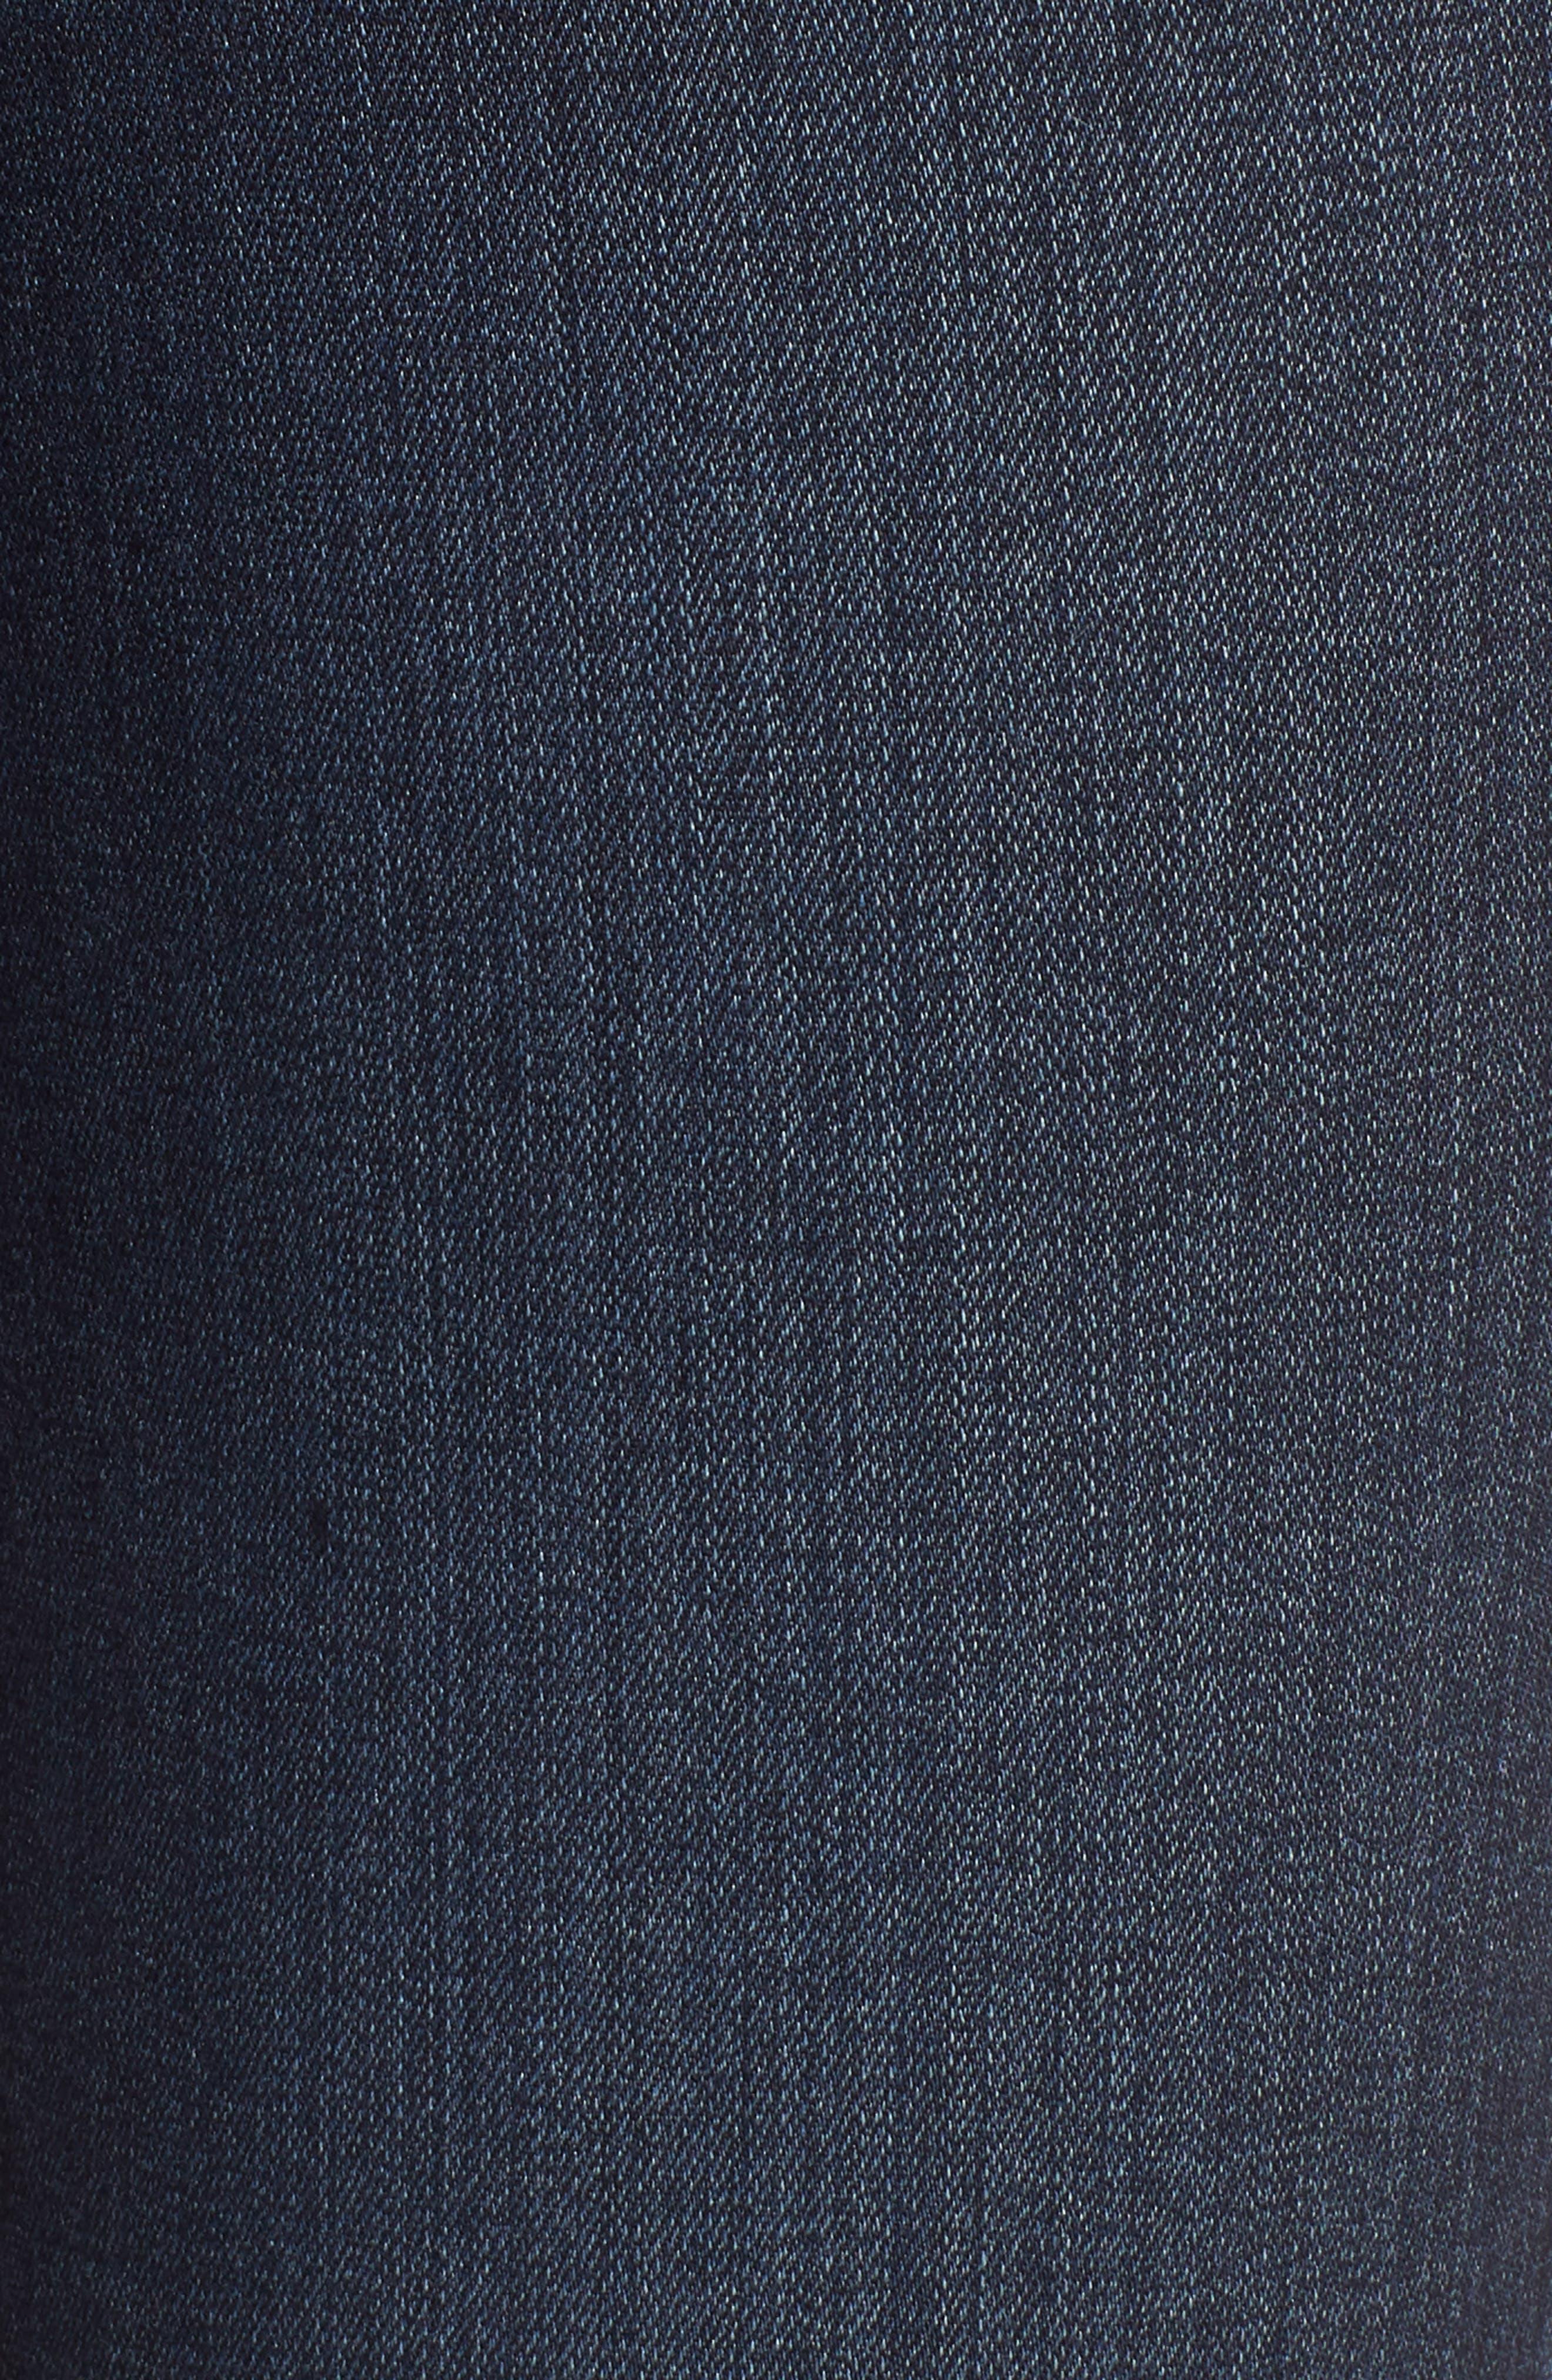 PAIGE, Manhattan High Waist Bootcut Jeans, Alternate thumbnail 6, color, ROSEVILLE